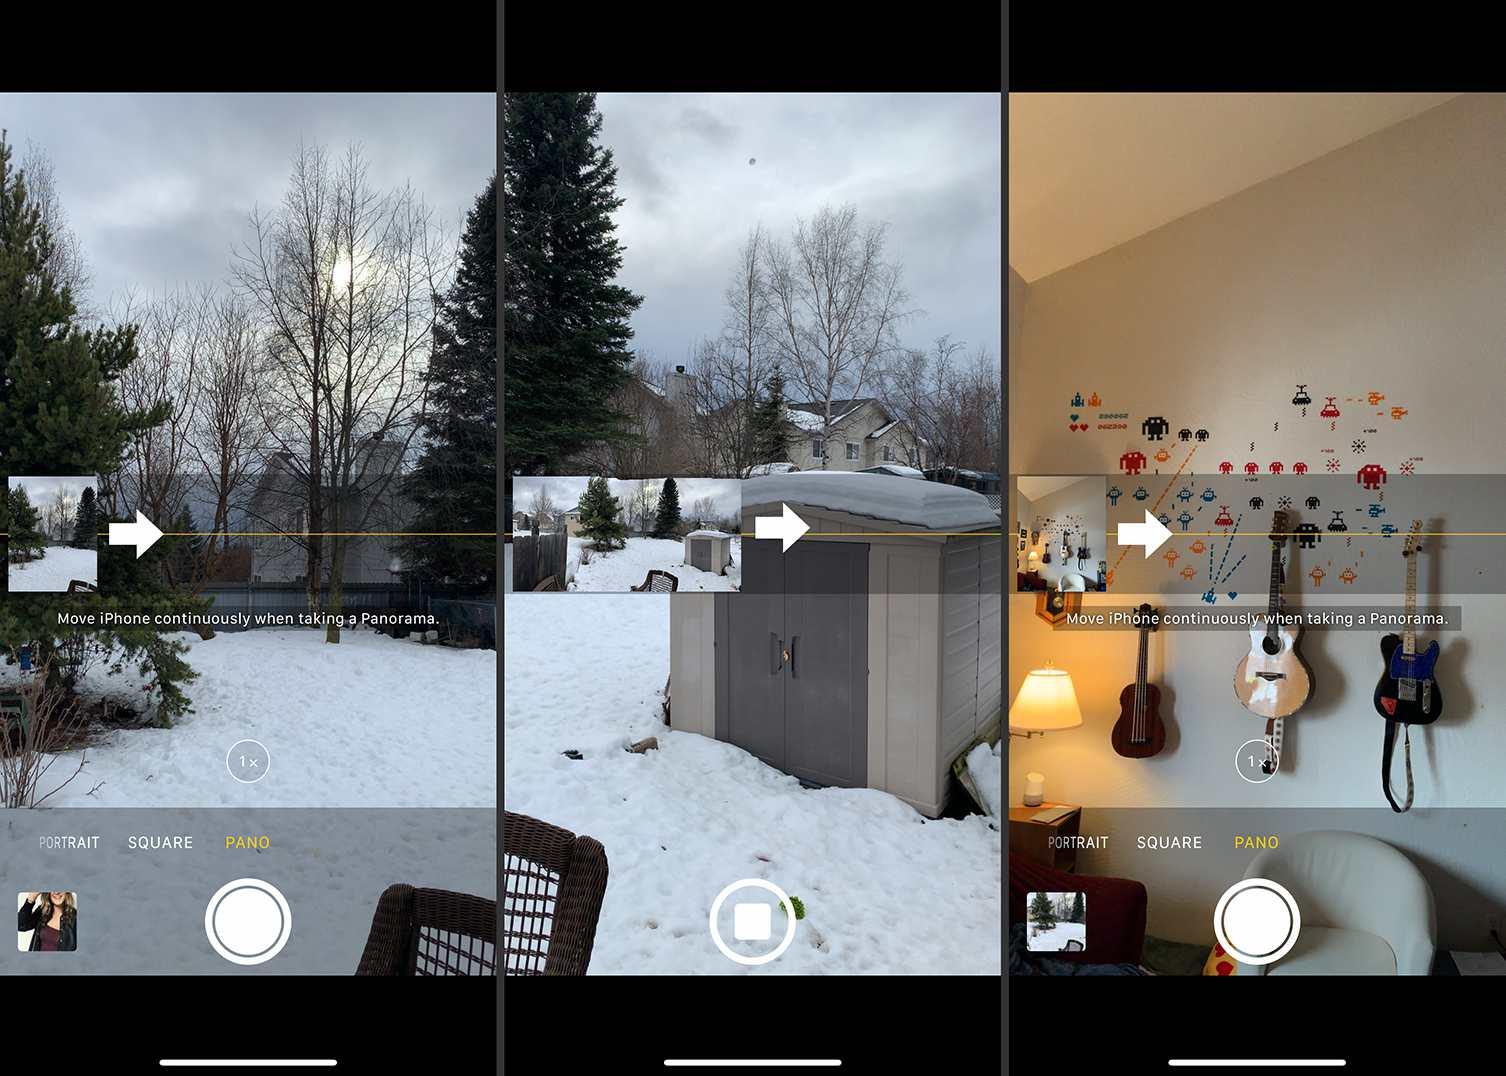 iOS Camera with panoramic shots